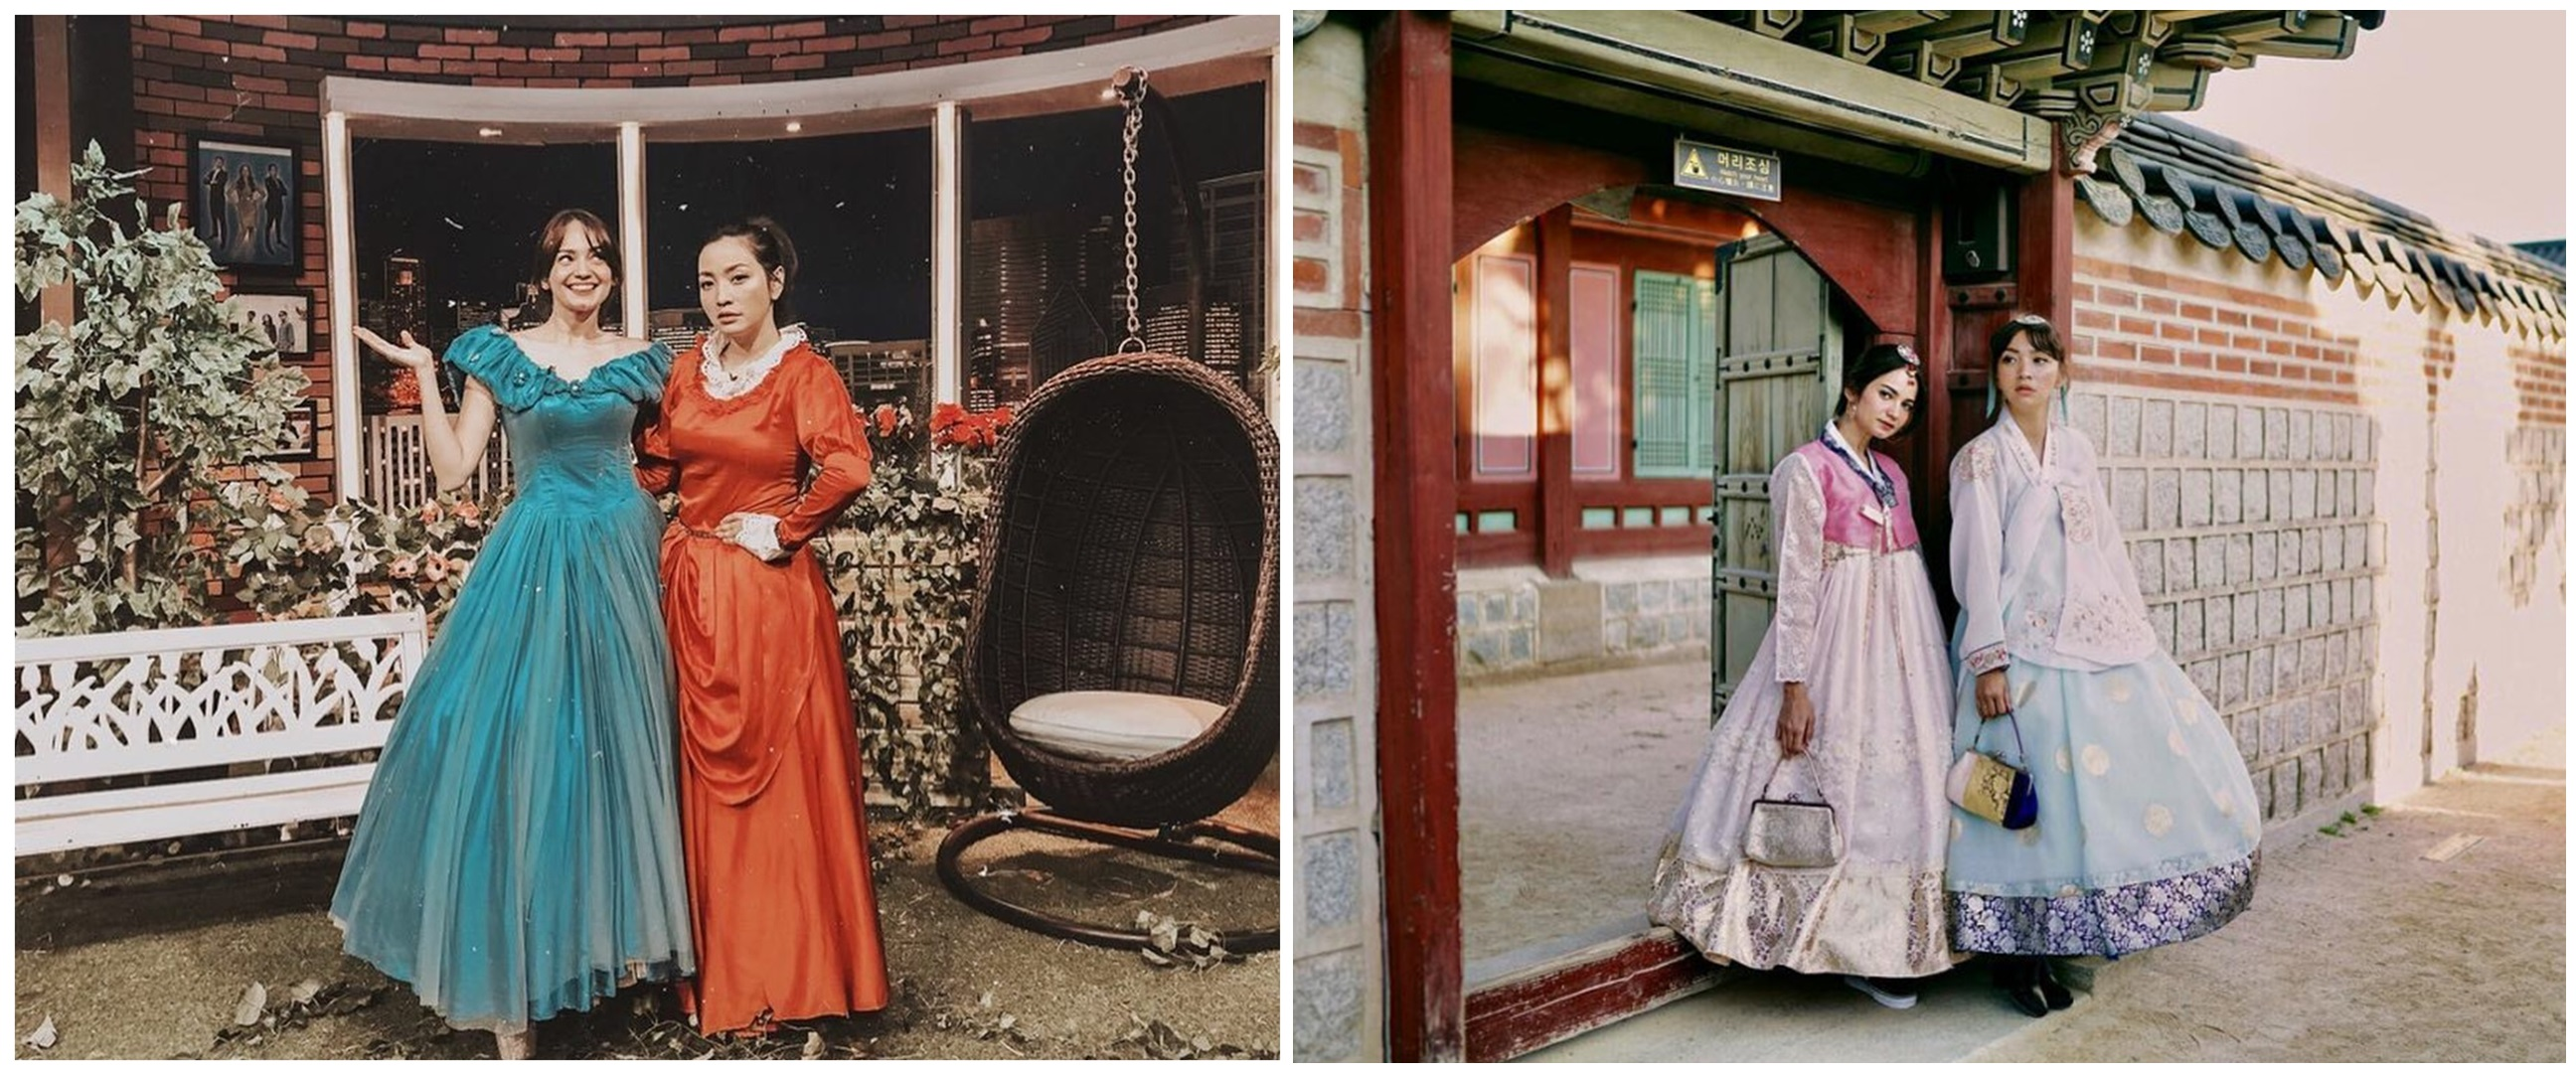 10 Potret persahabatan Hesti Purwadinata dan Enzy Storia, bak seumuran